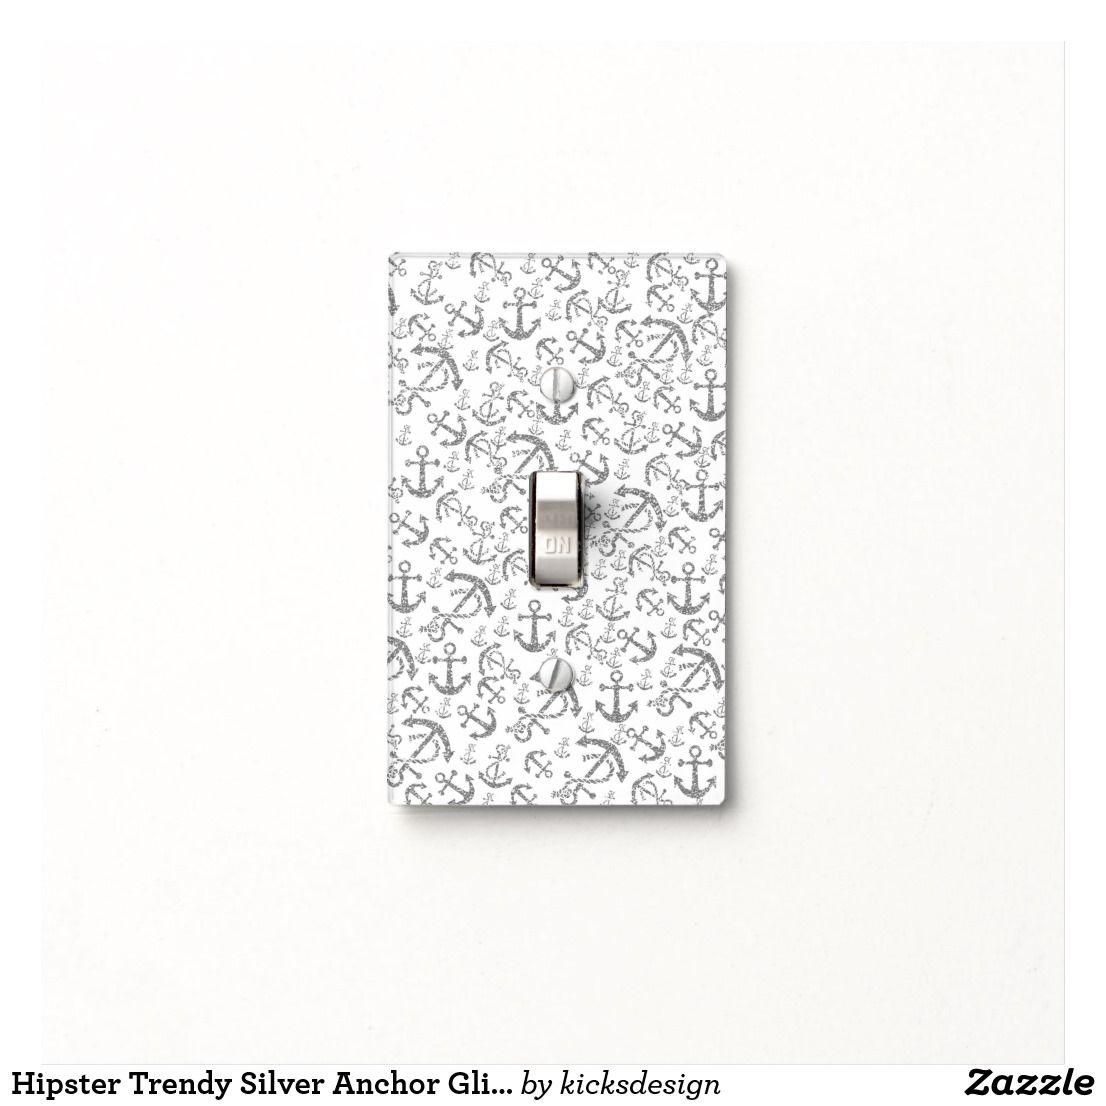 Hipster Trendy Silver Anchor Glitter Photo Print Light